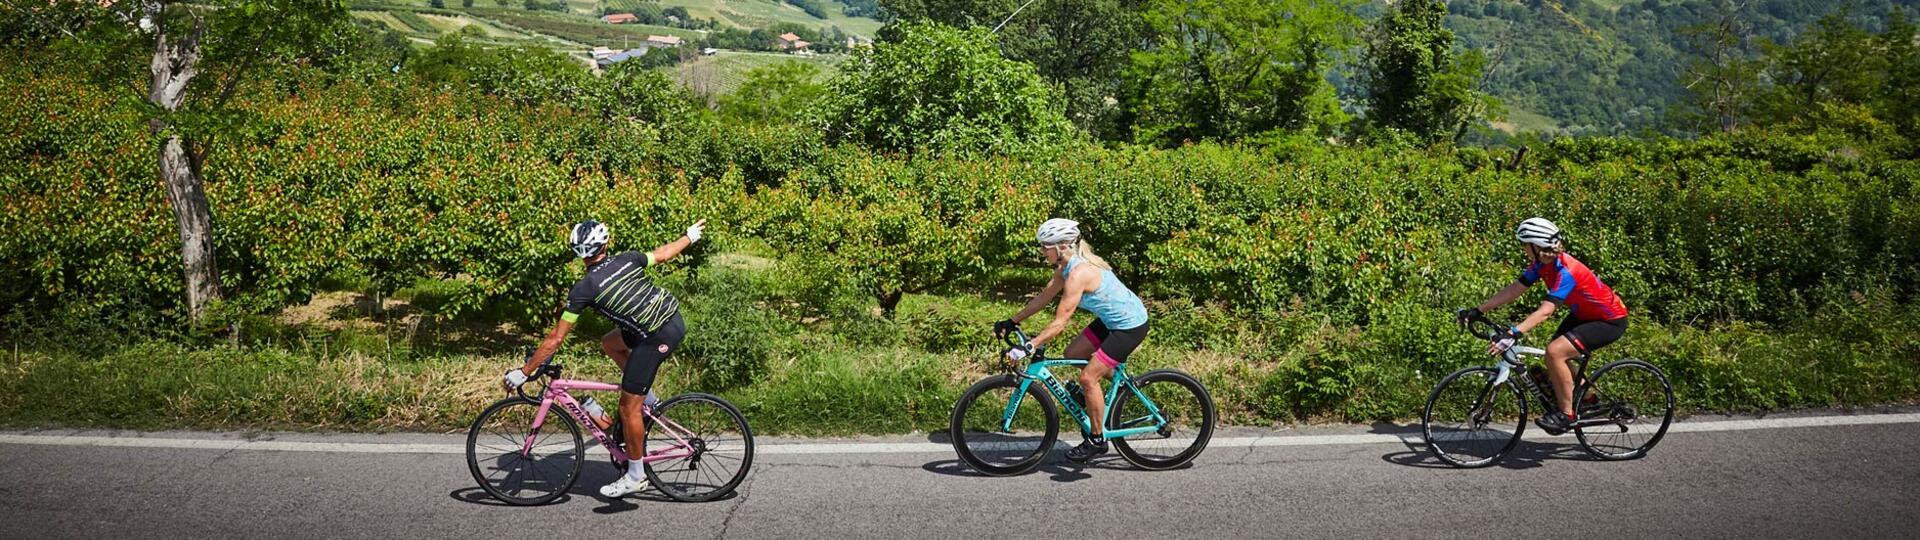 cycling.oxygenhotel en road-bike-routes-rimini 014